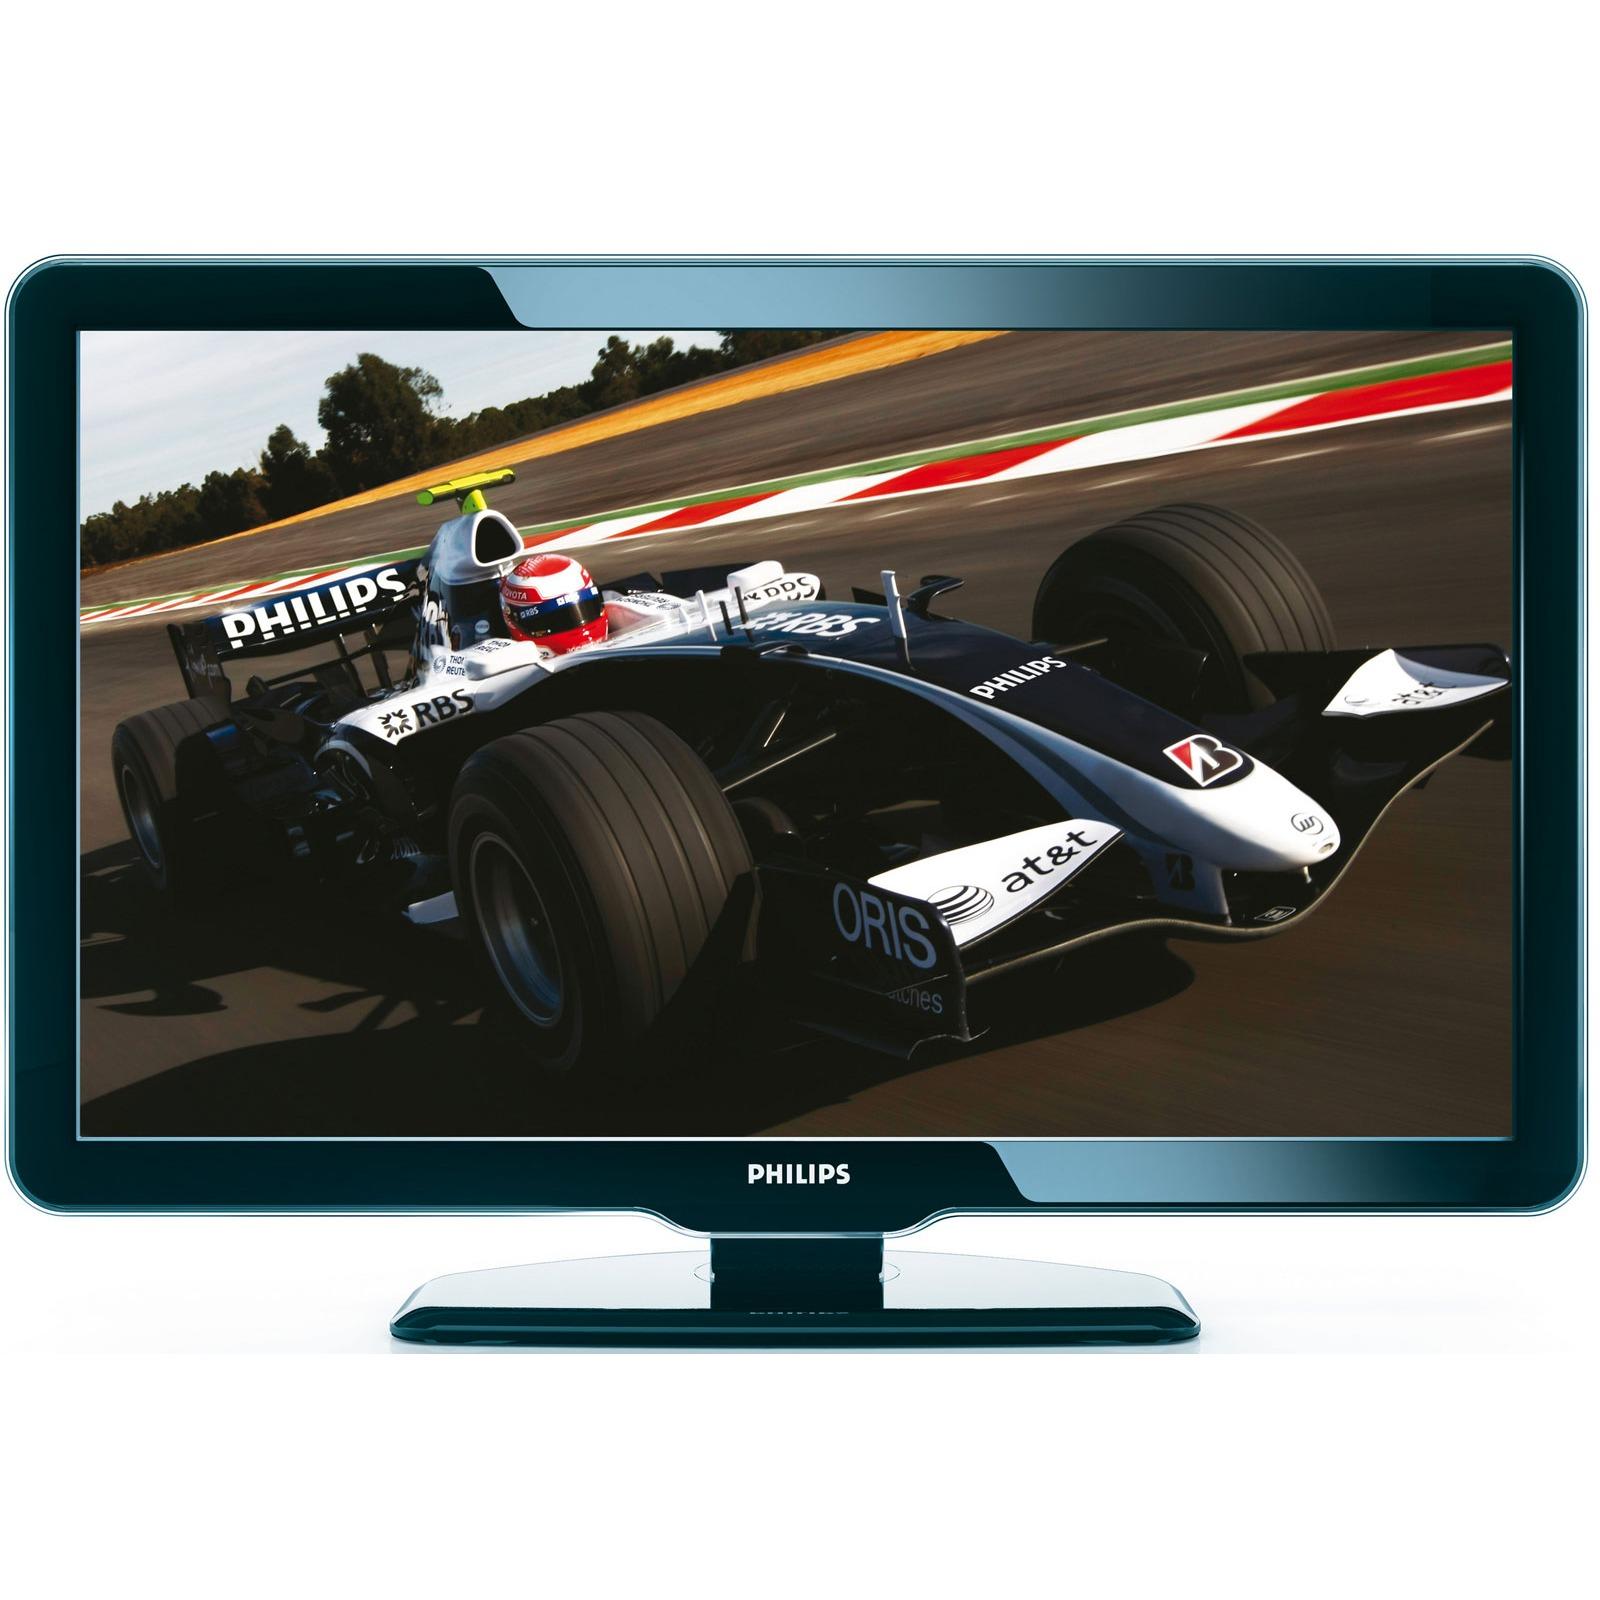 tv 107 cm pas cher. petite taille darty u caen with tv 107 cm pas